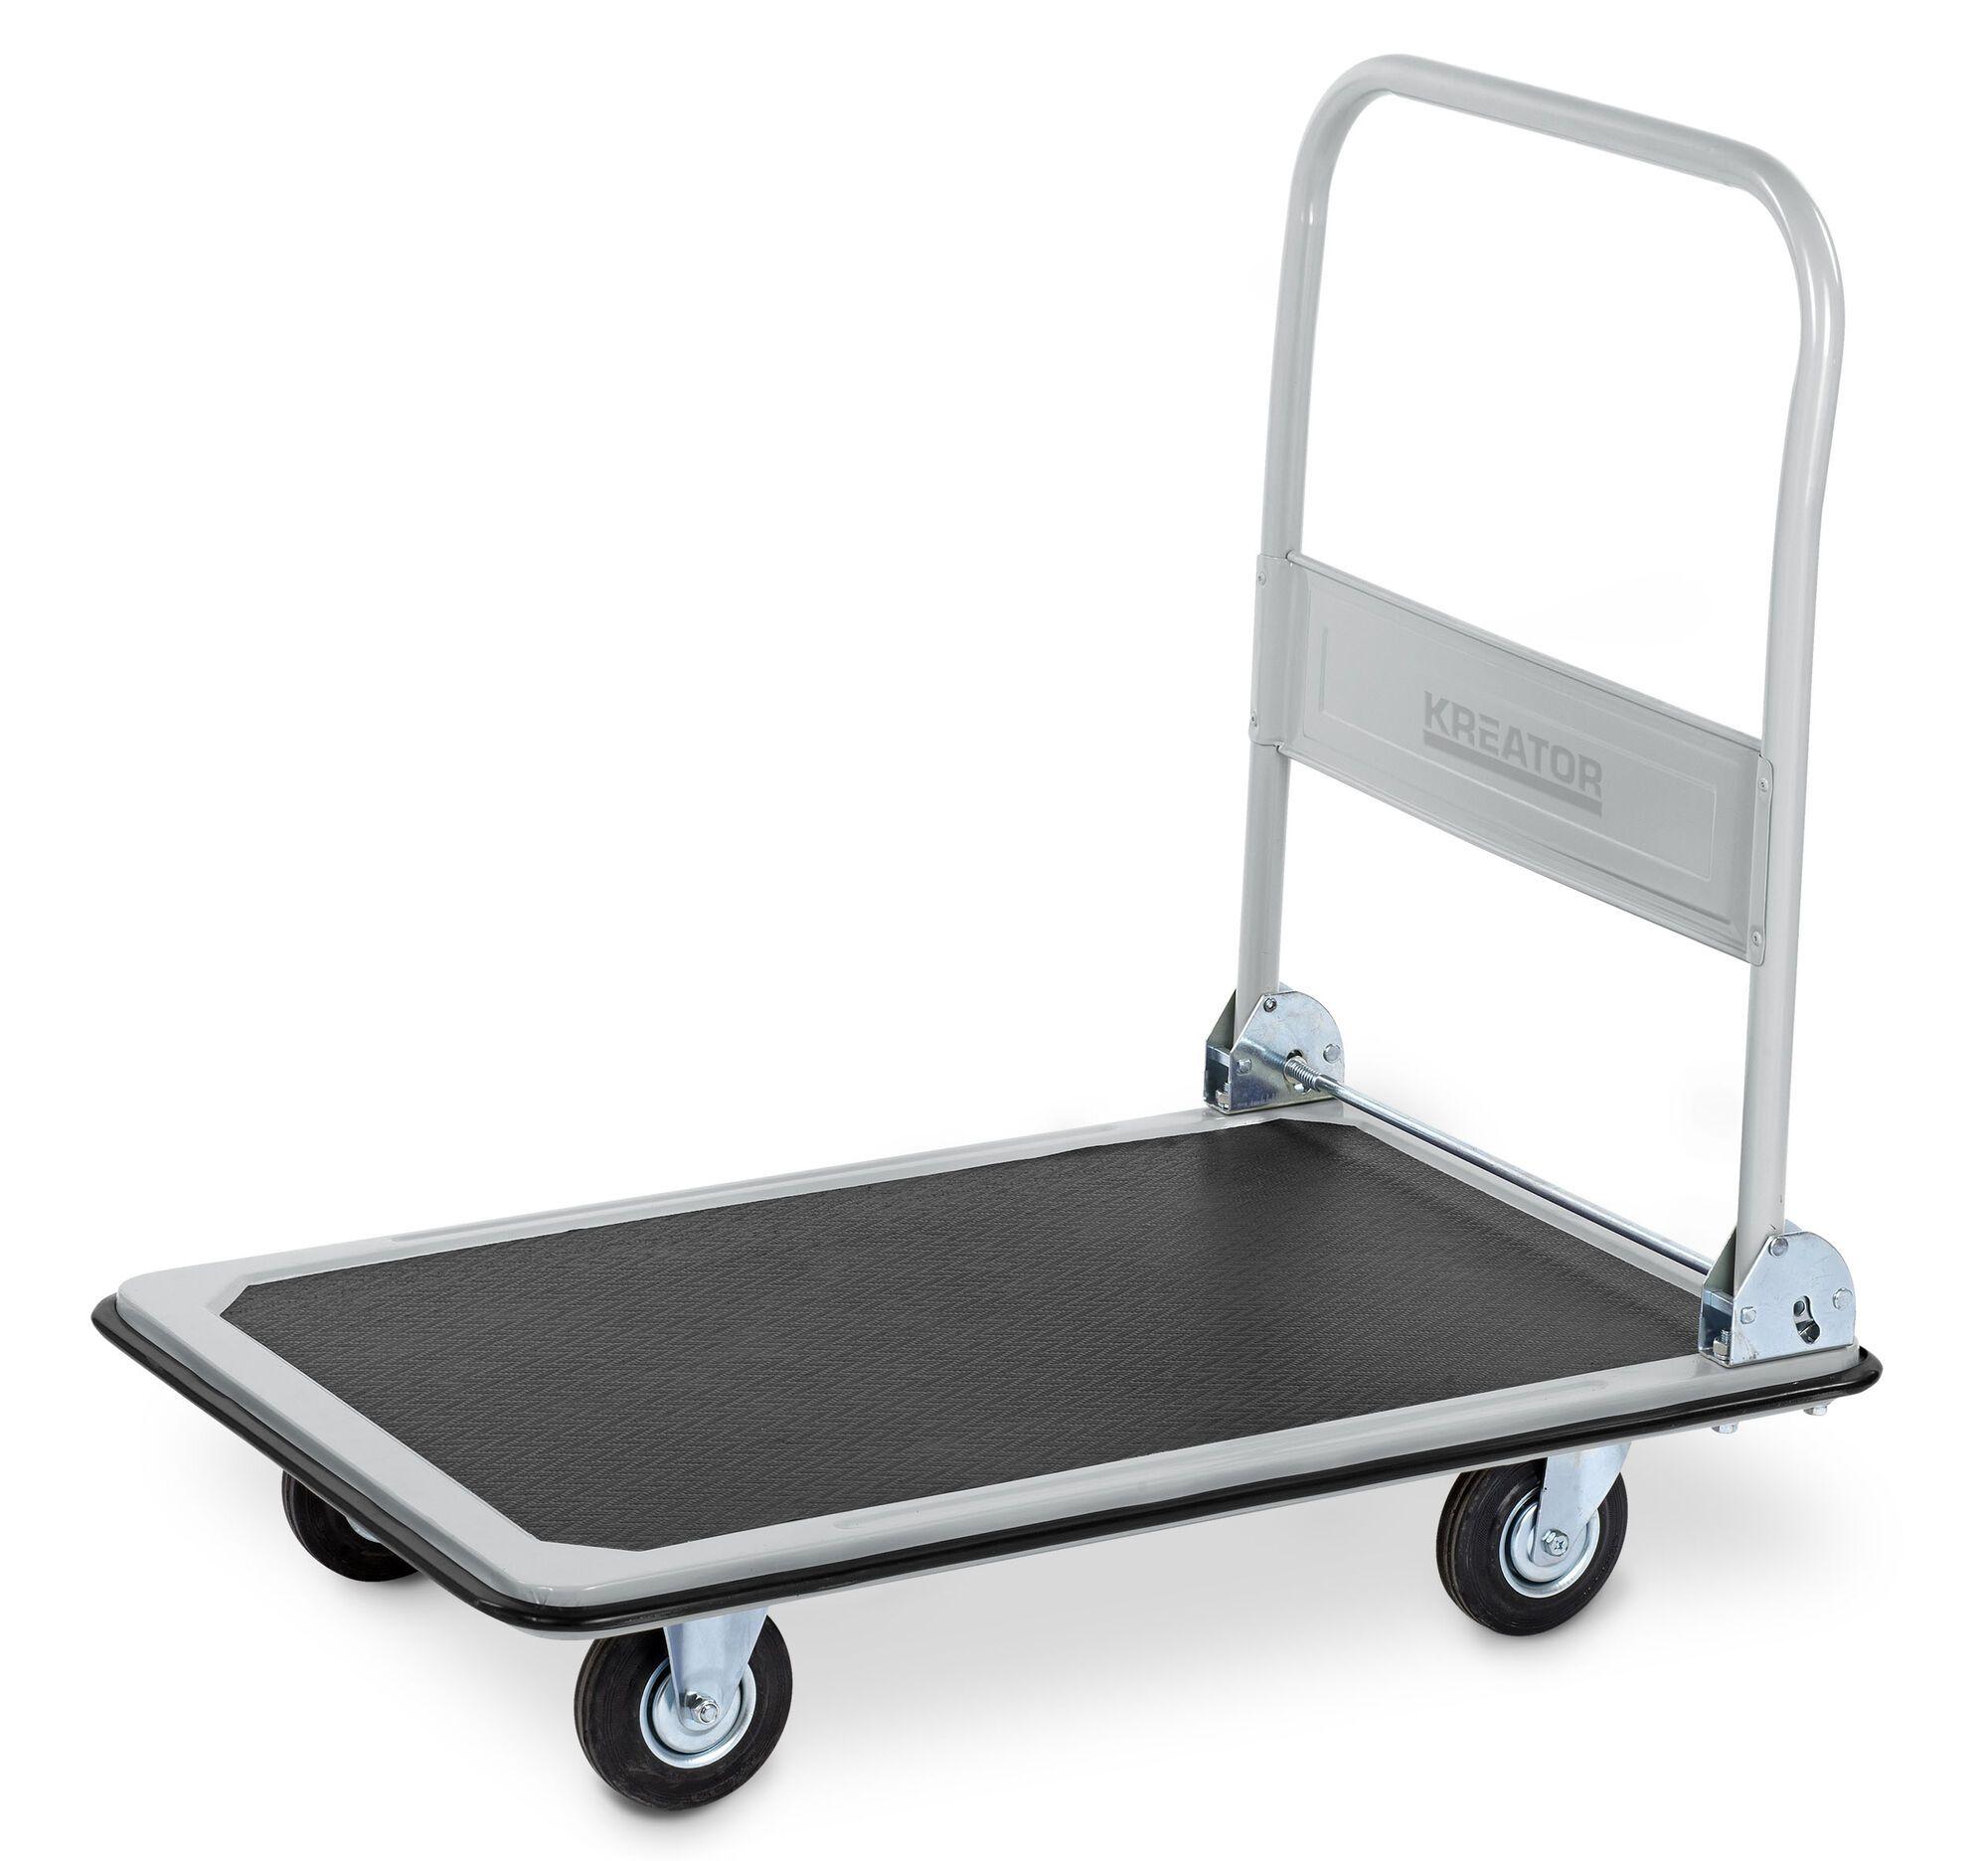 Kreator KRT670102 Vouwbare magazijnwagen 300kg | Plateauwagen